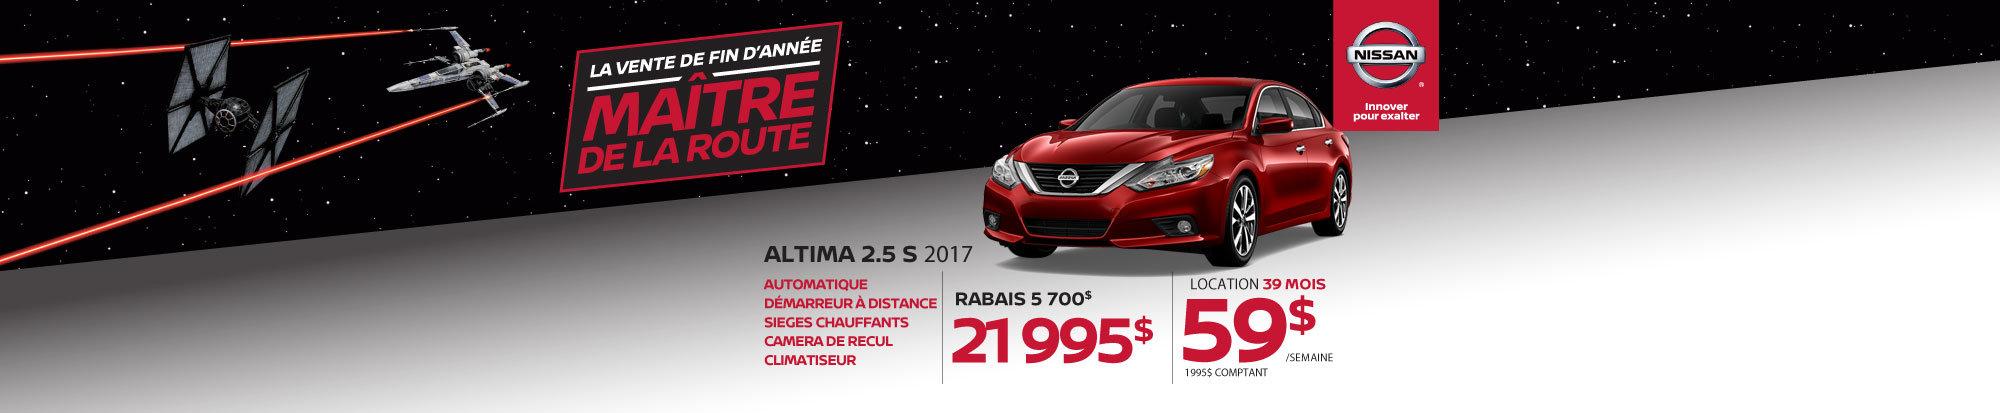 Nissan Altima 2017 web